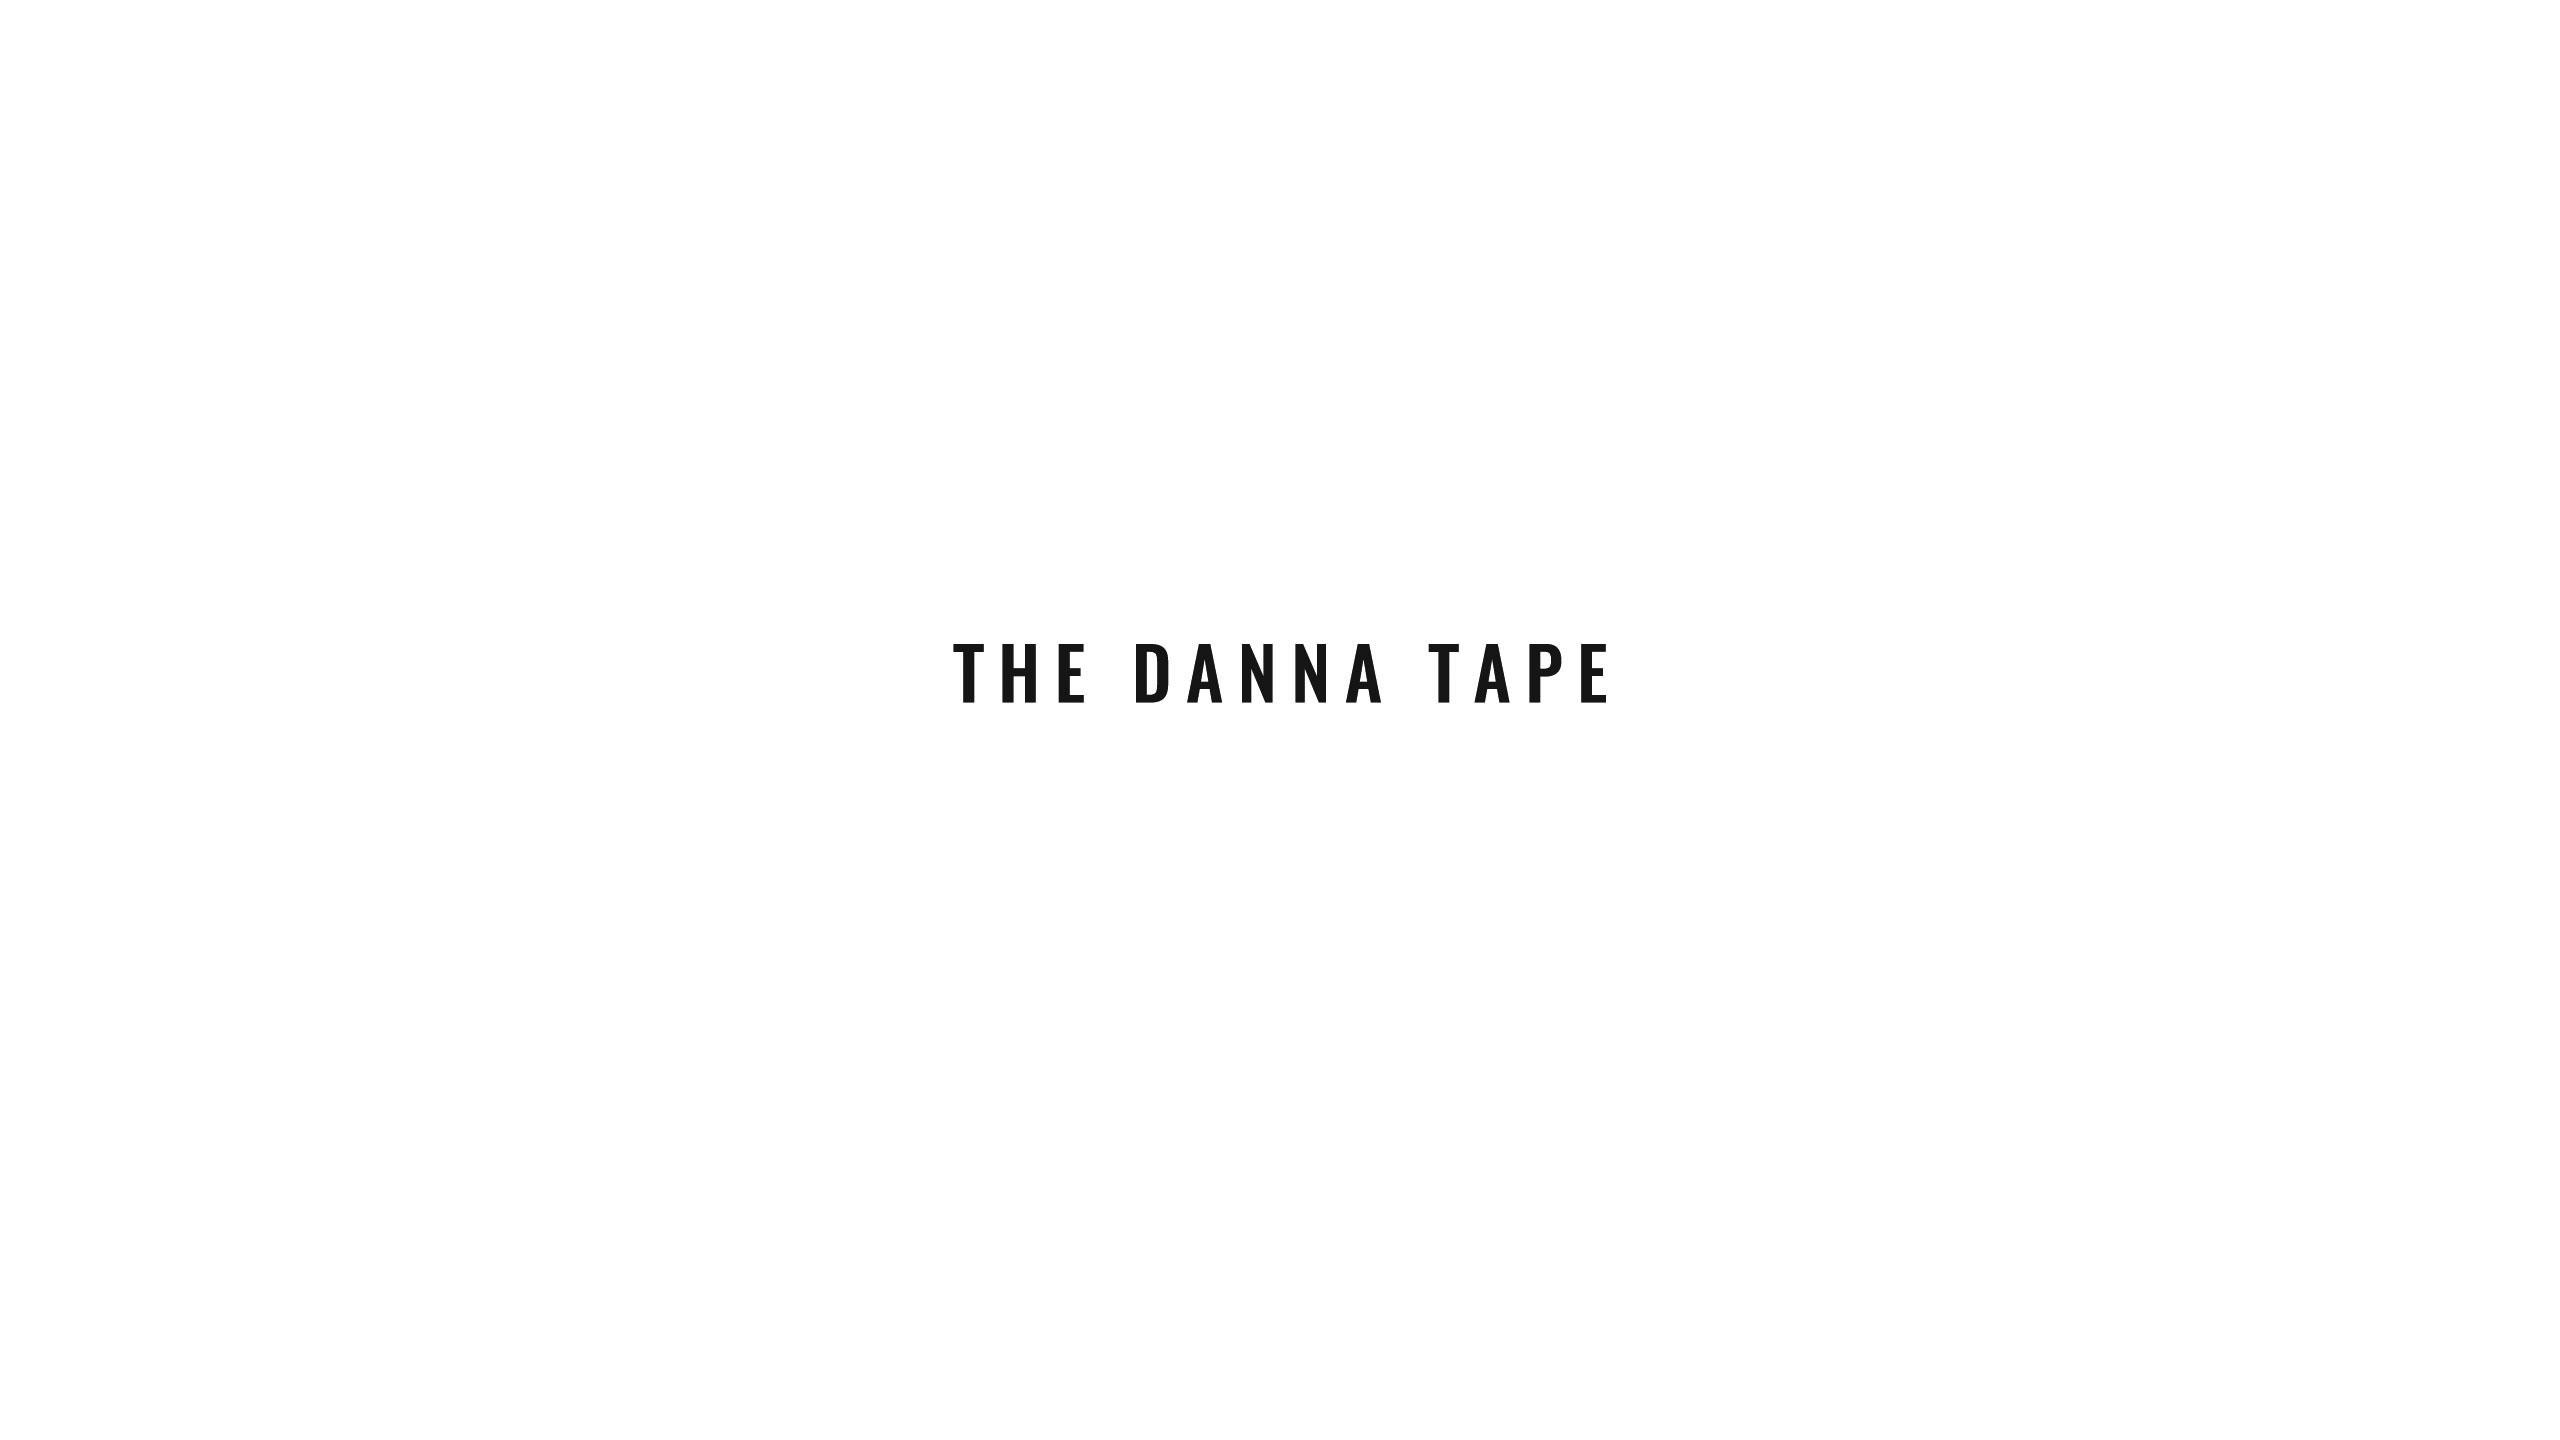 1a_Text_theDannaTape